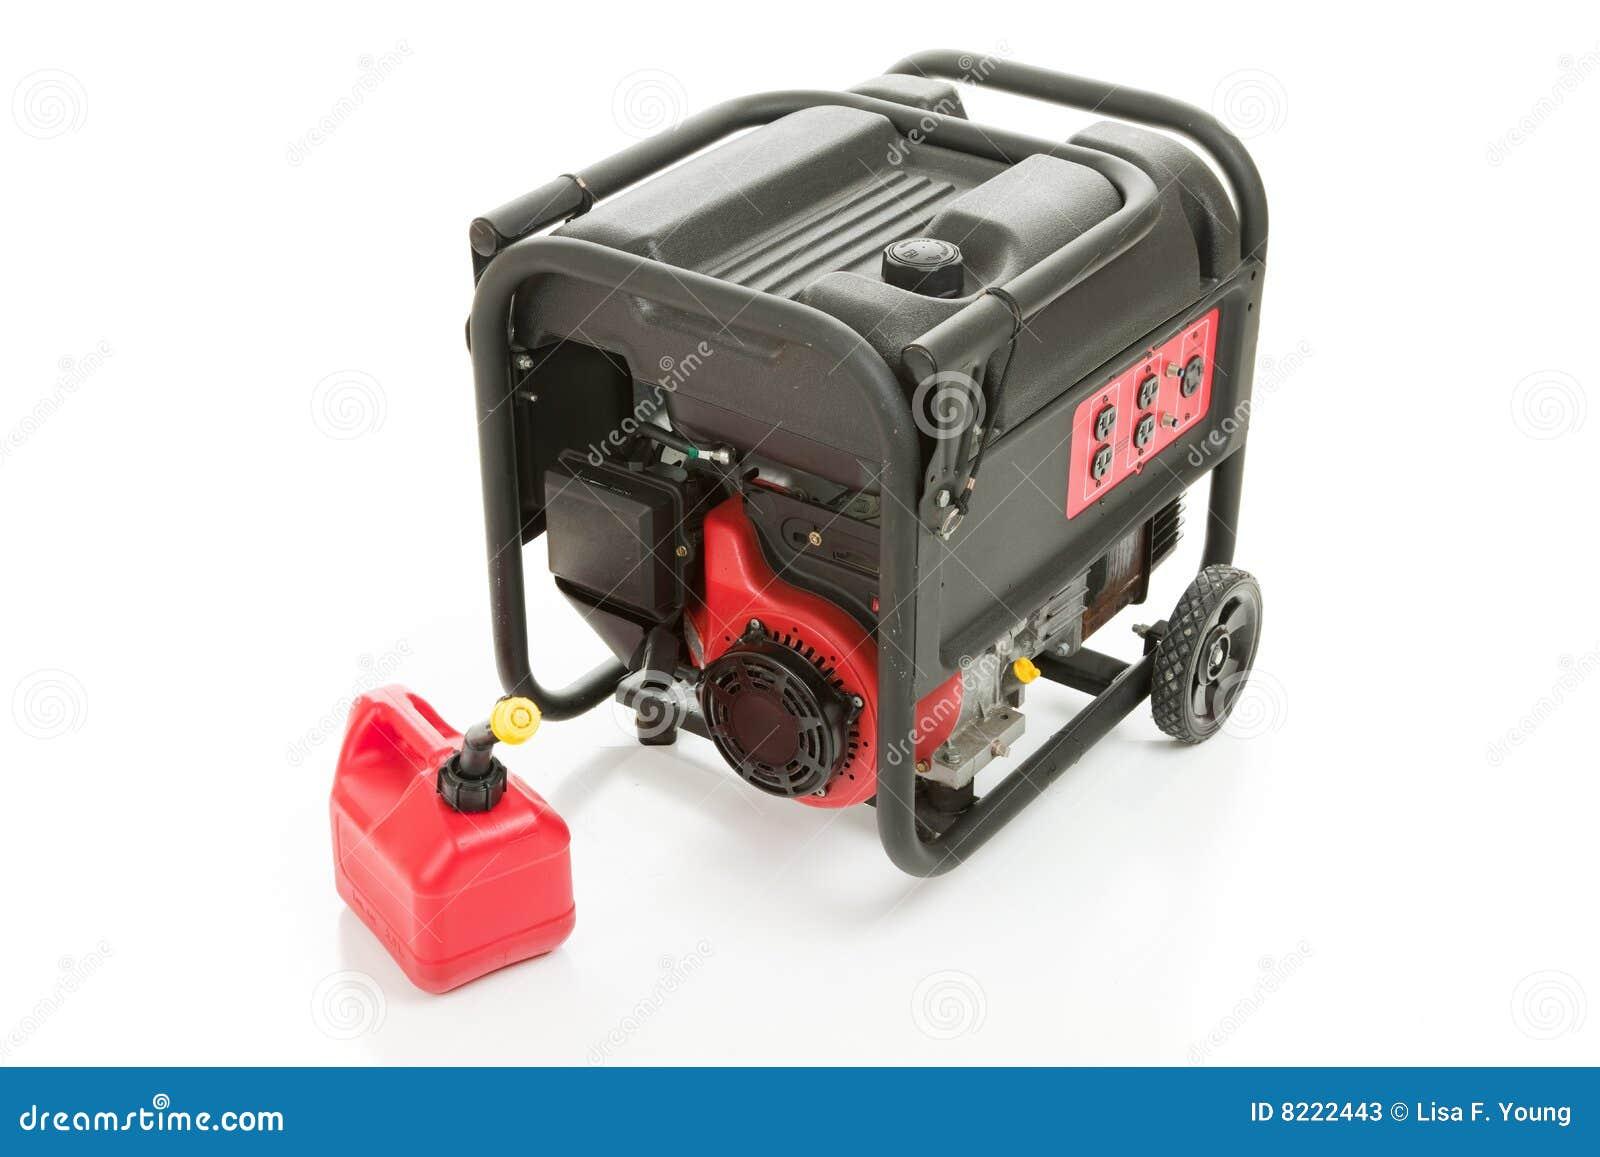 ... generator clip art electrical clip art turbine generator clip art